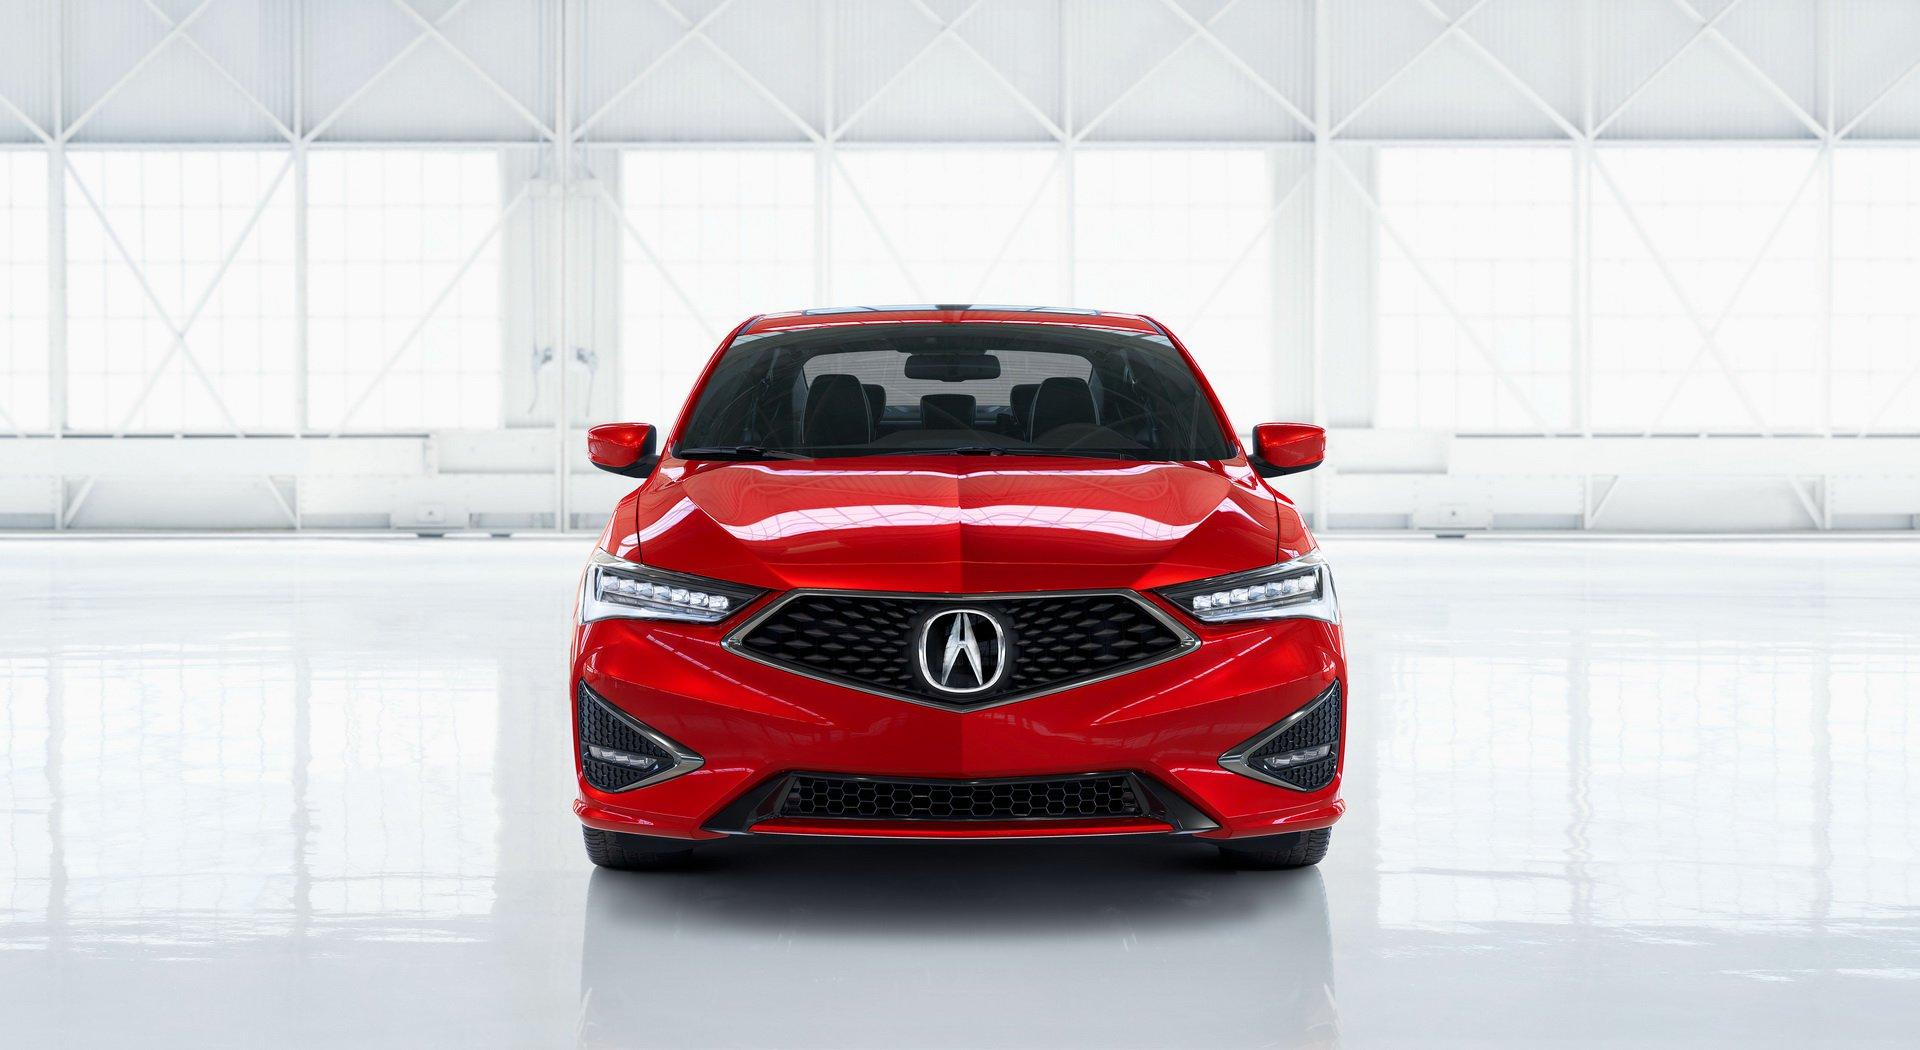 Acura ILX Loses Beak For 2019 Model Year - autoevolution